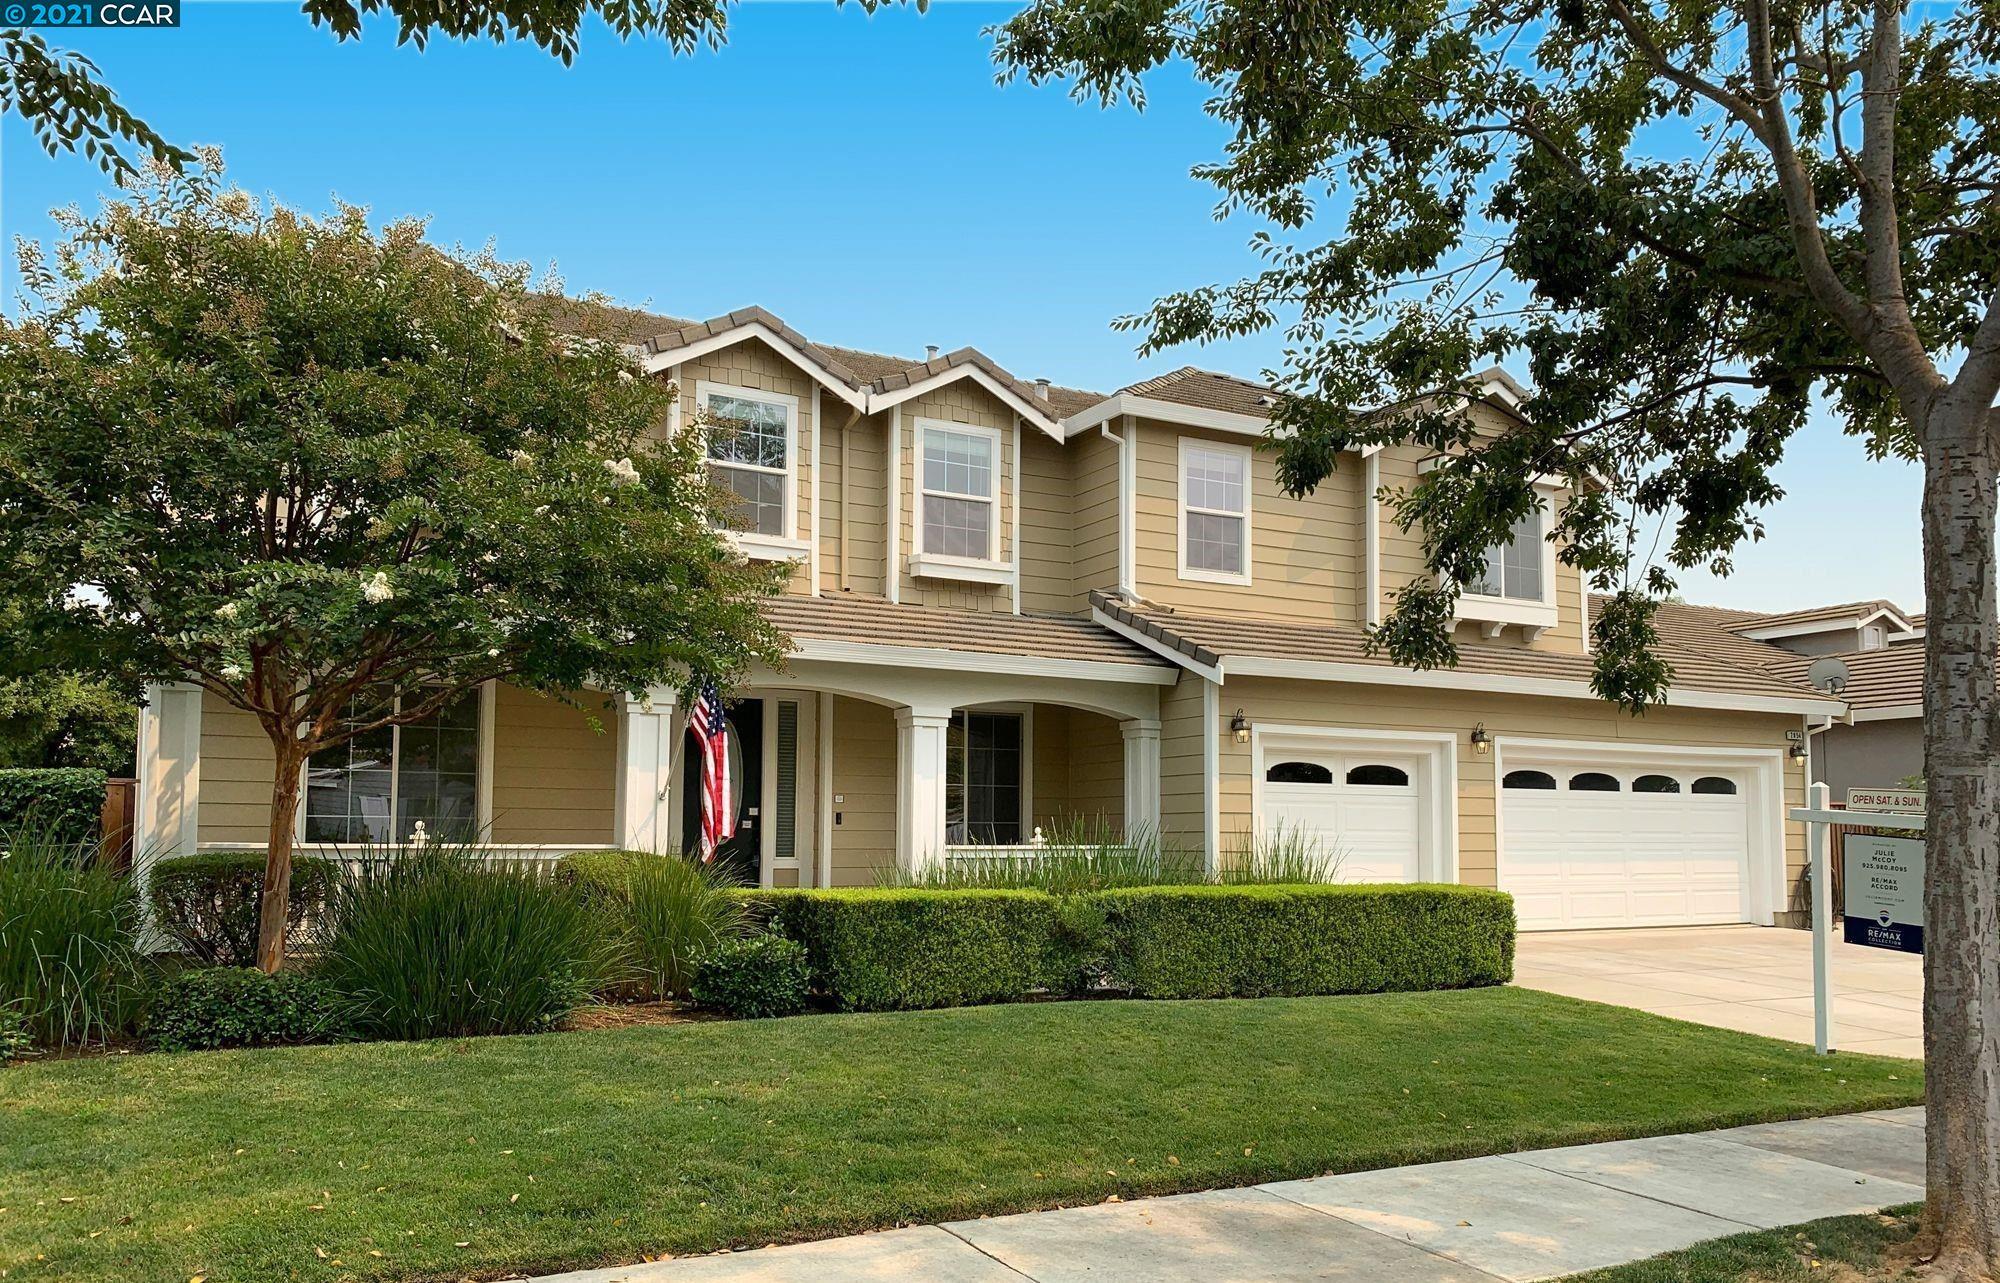 2854 Gardenside Ct, BRENTWOOD, CA 94513